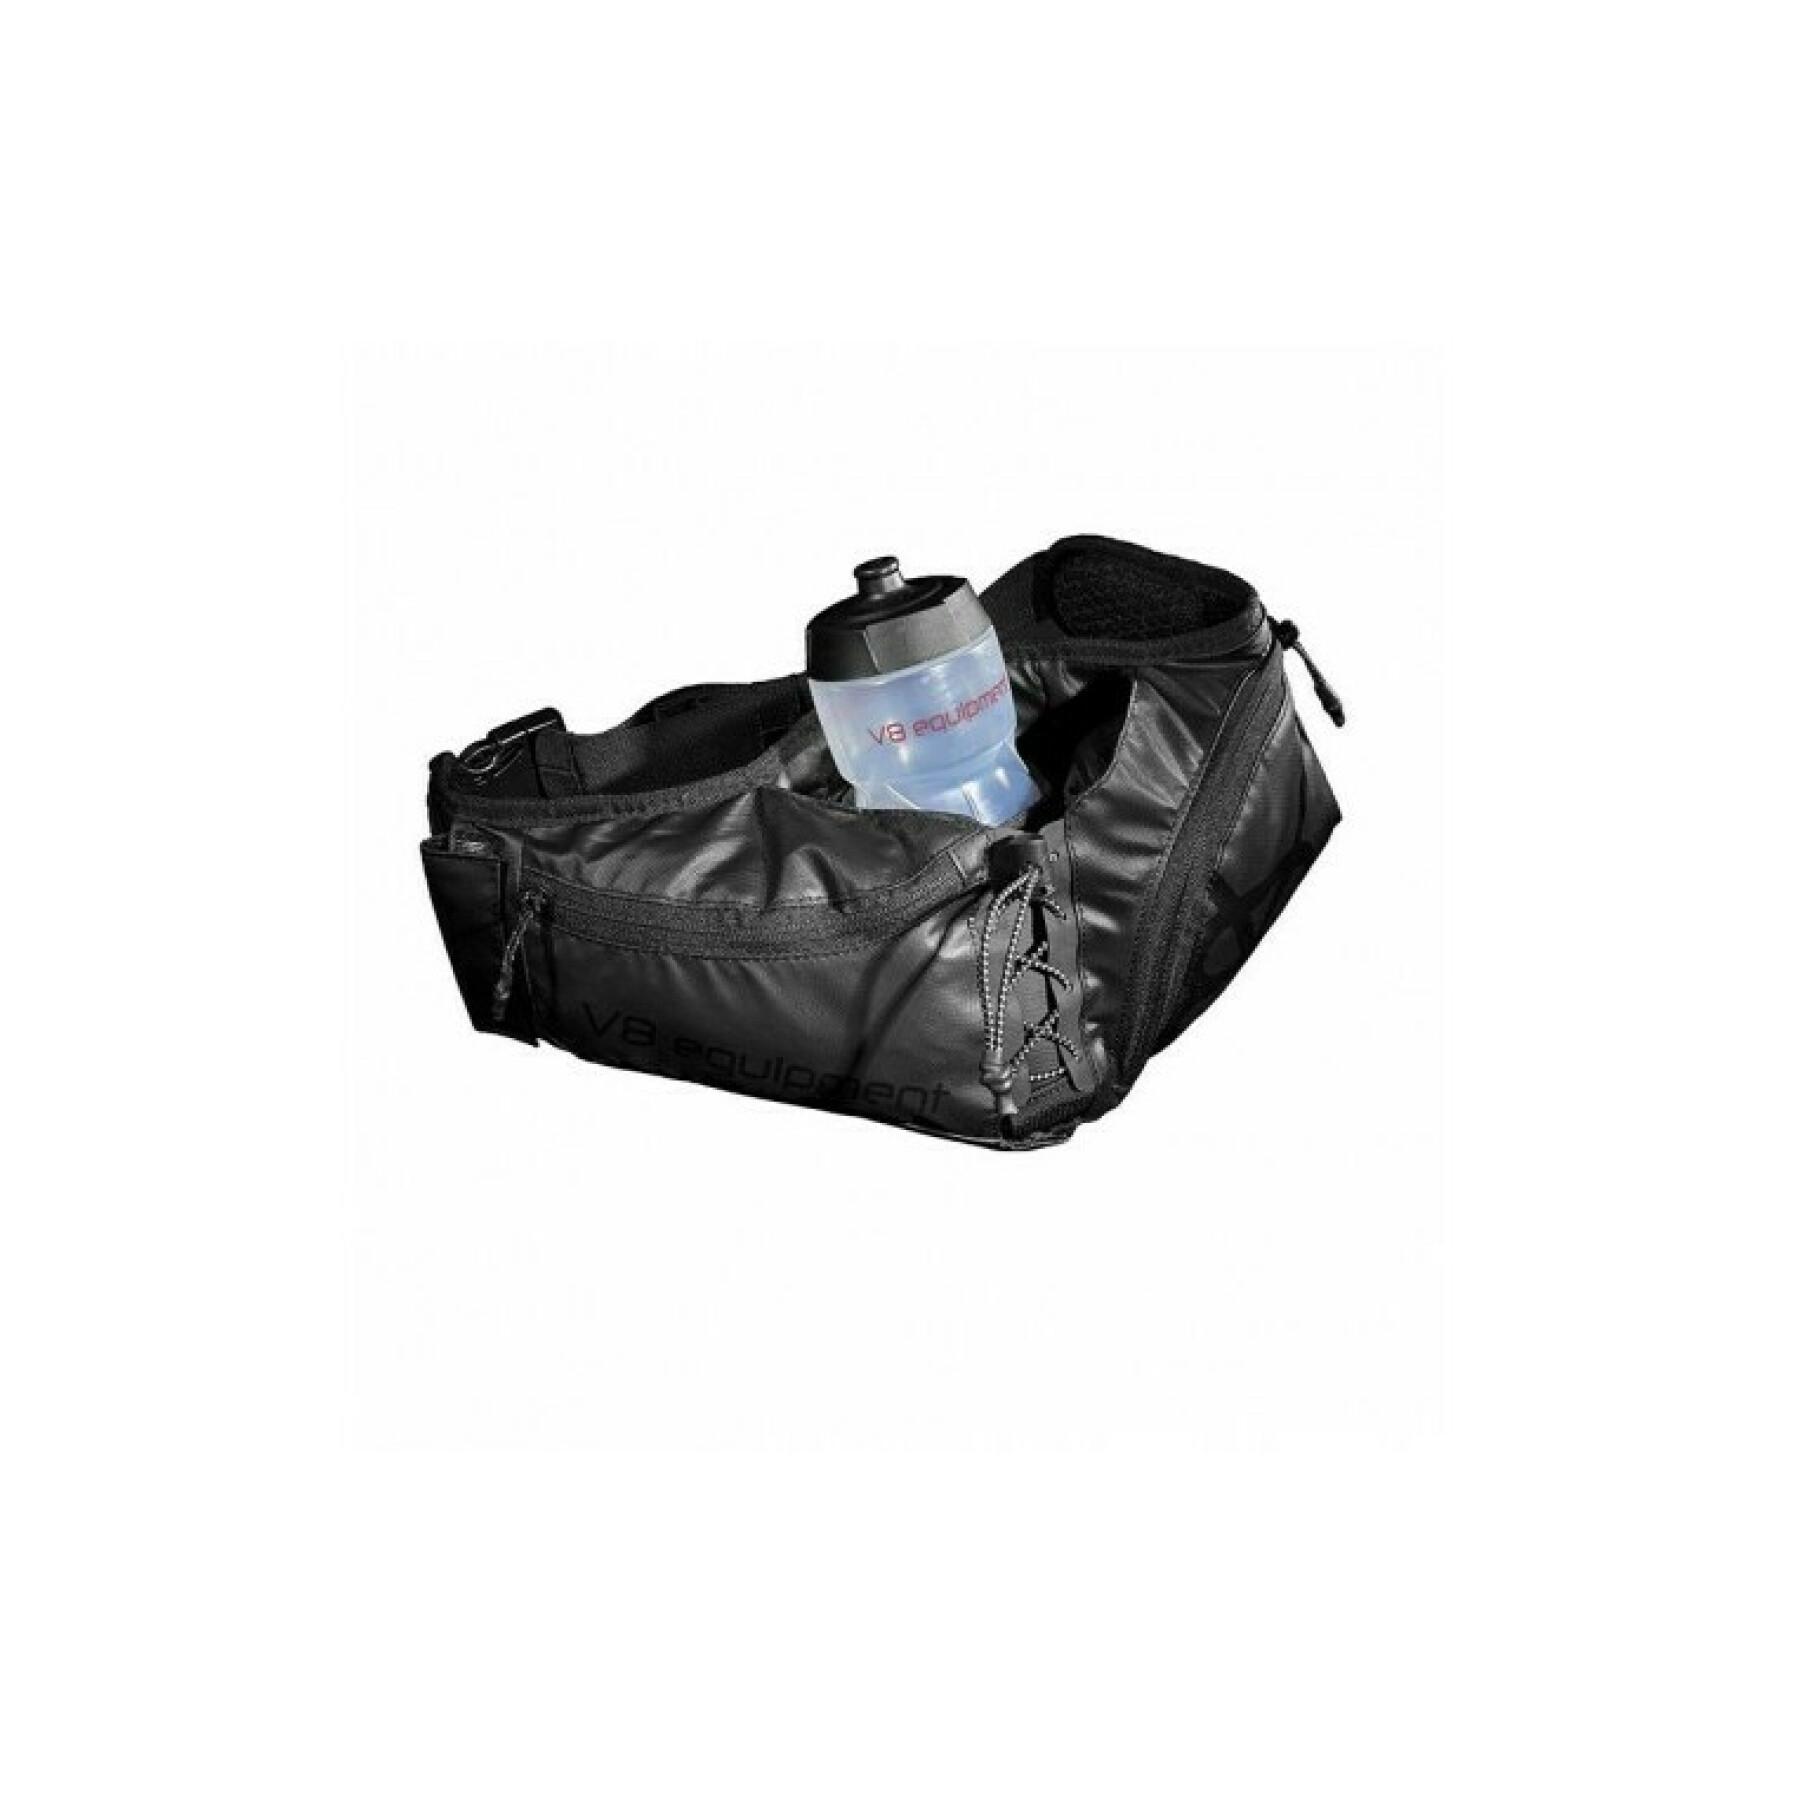 Hydration belt with water bottle V8 Concepts BNA 3,6.1